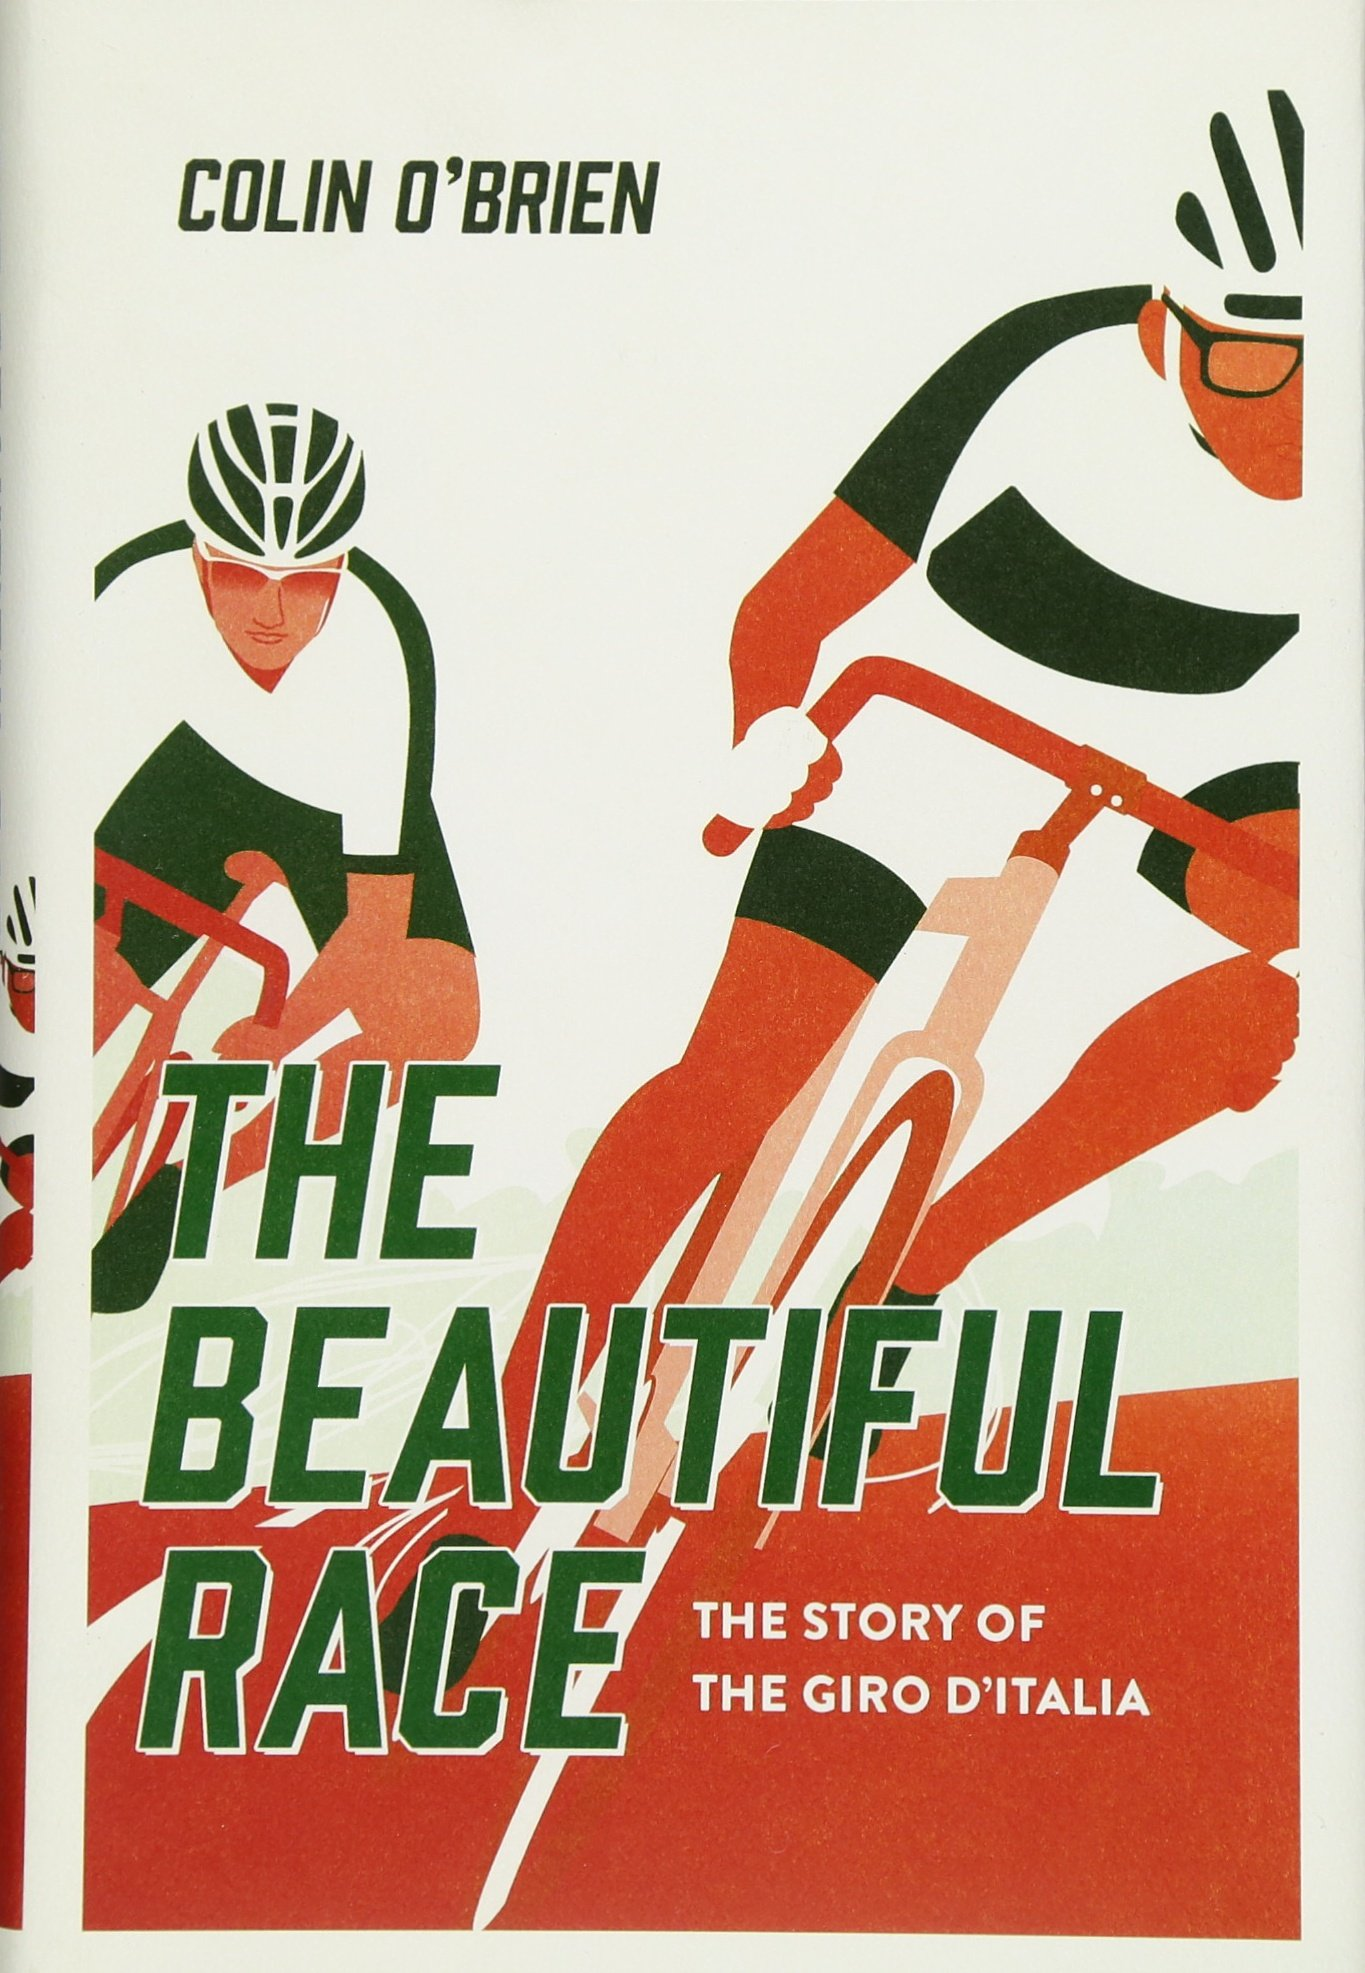 The Beautiful Race: The Story of the Giro d'Italia: Colin O'Brien:  9781681776644: Amazon.com: Books